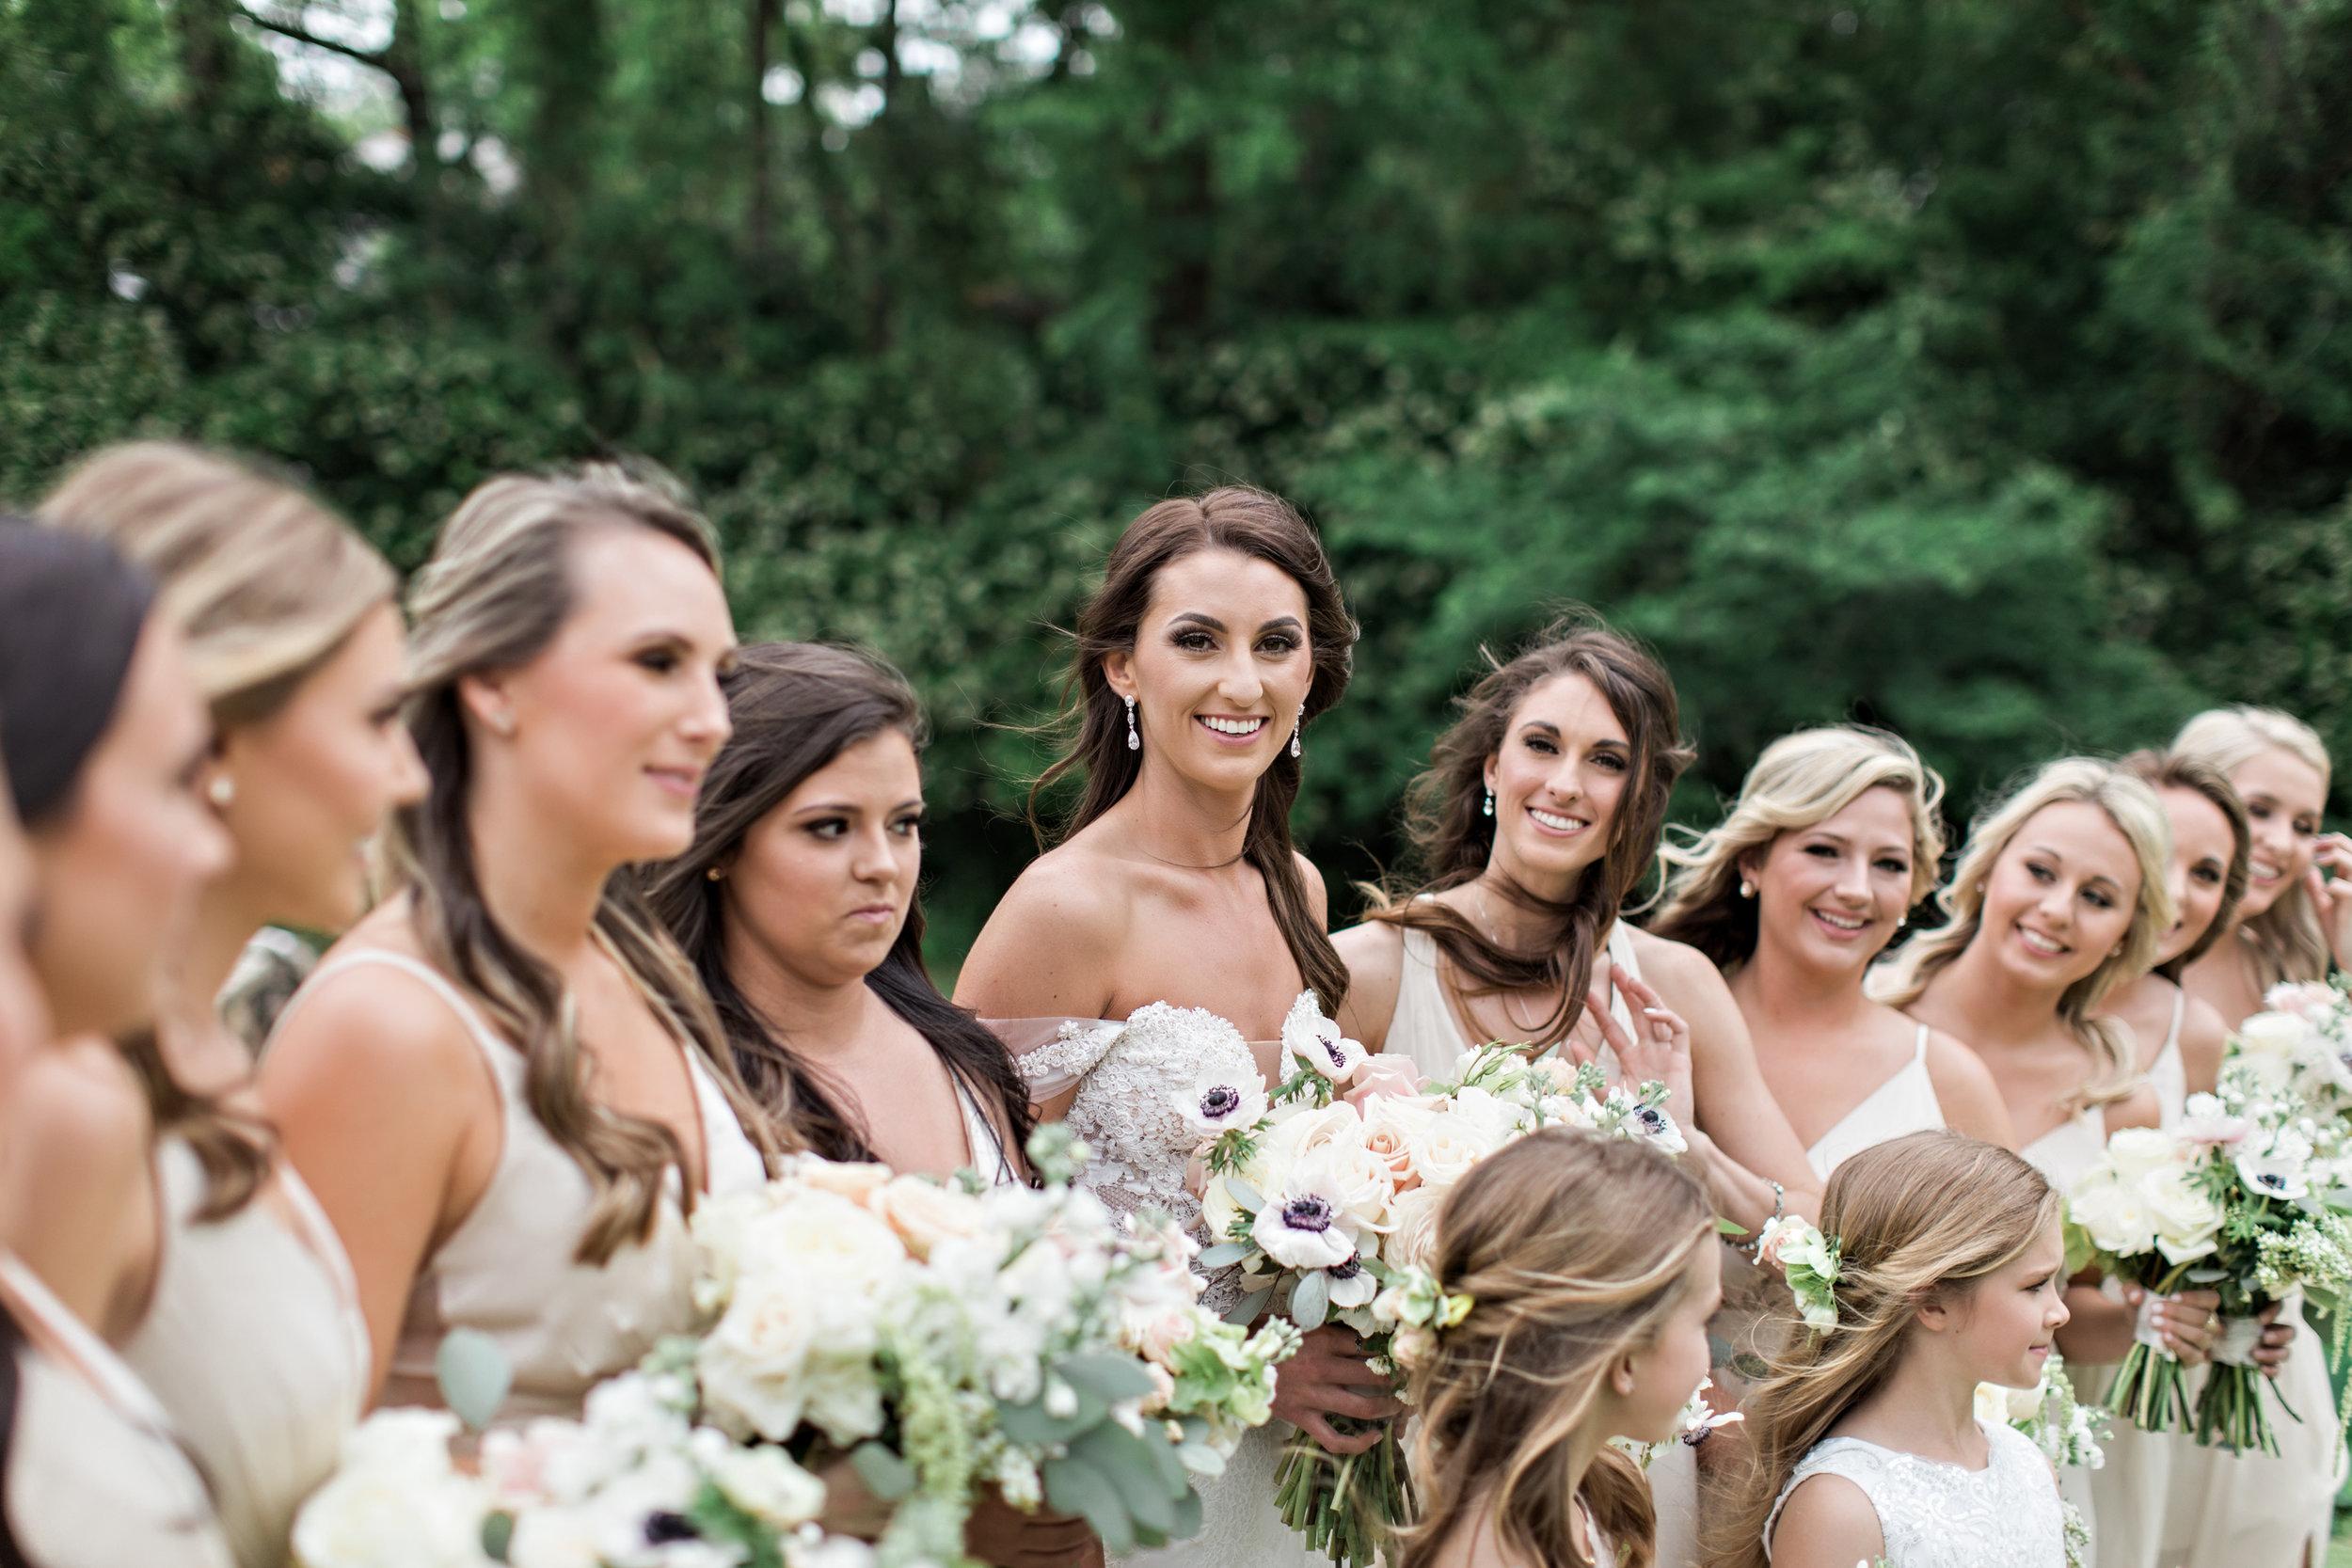 Matty-Drollette-Montgomery-Alabama-Wedding-Photography-132.jpg